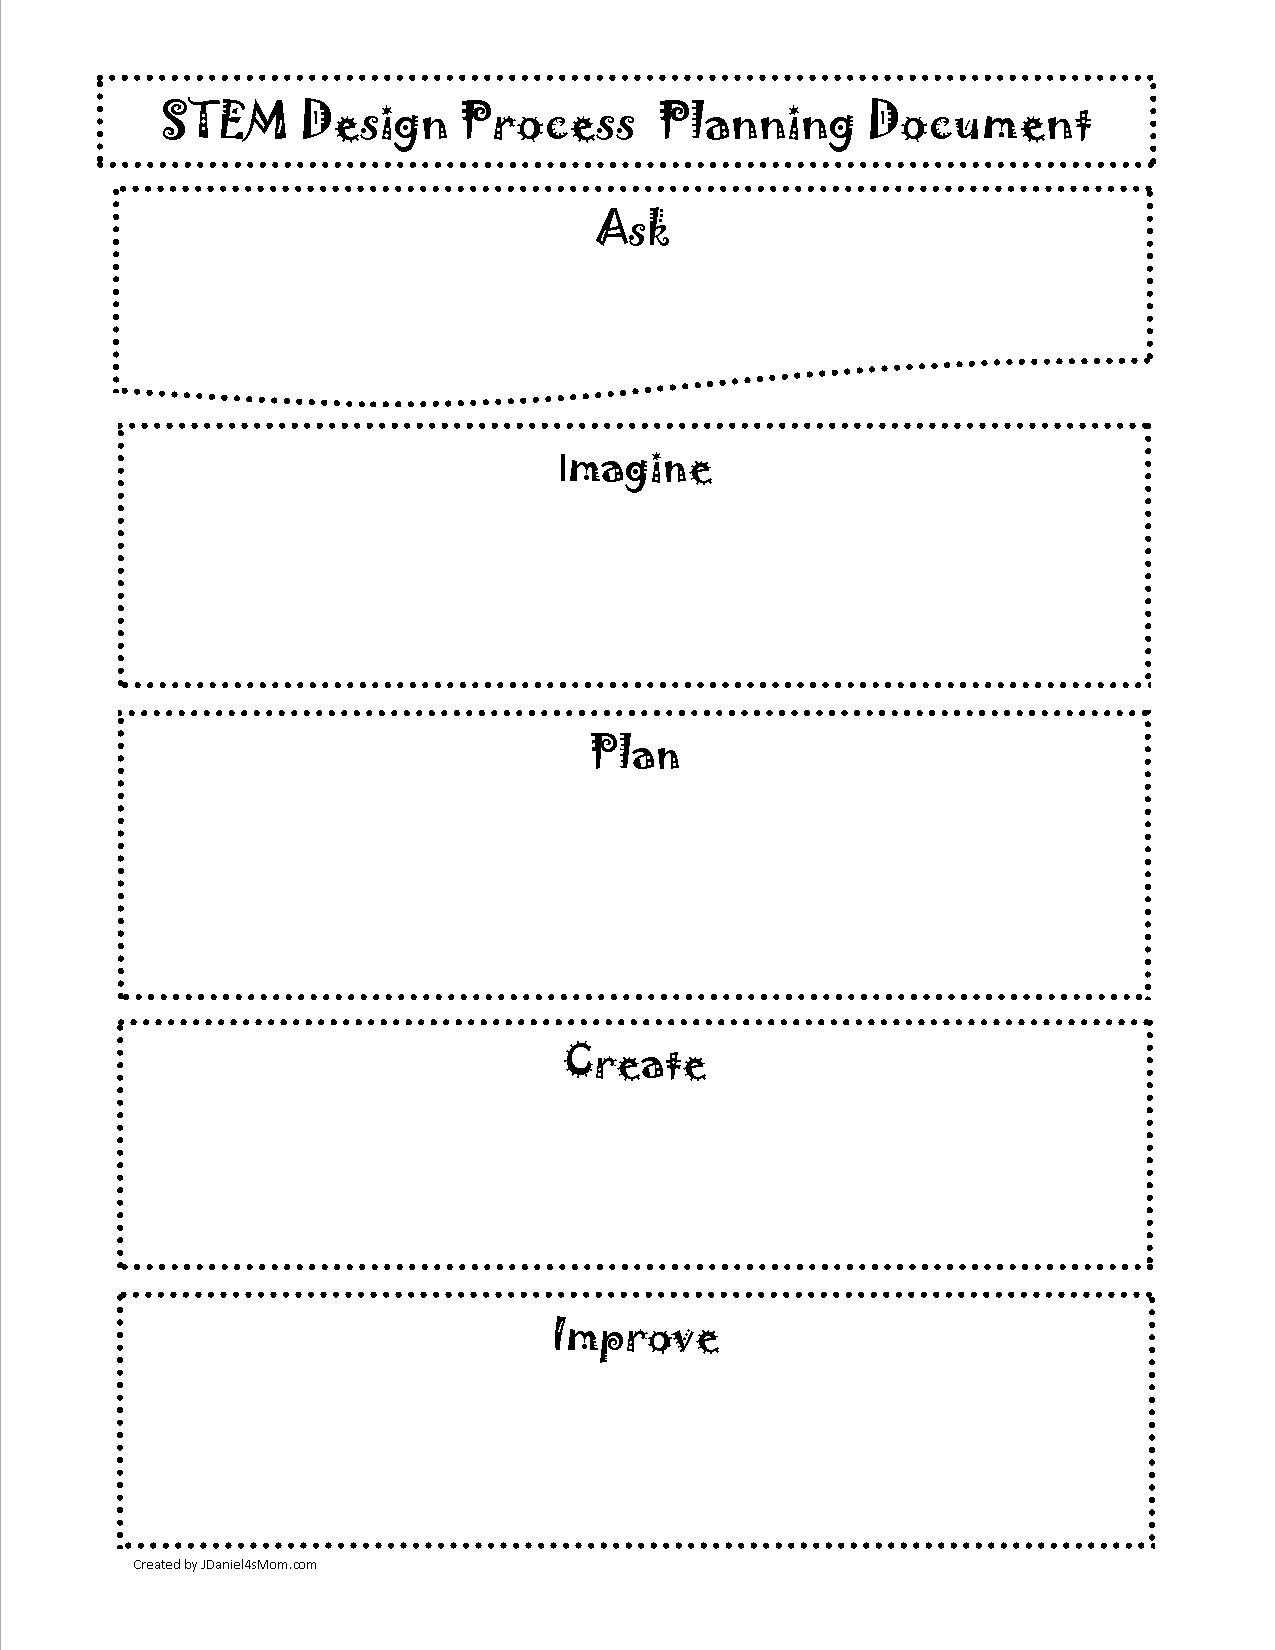 stem-design-process-planning-document